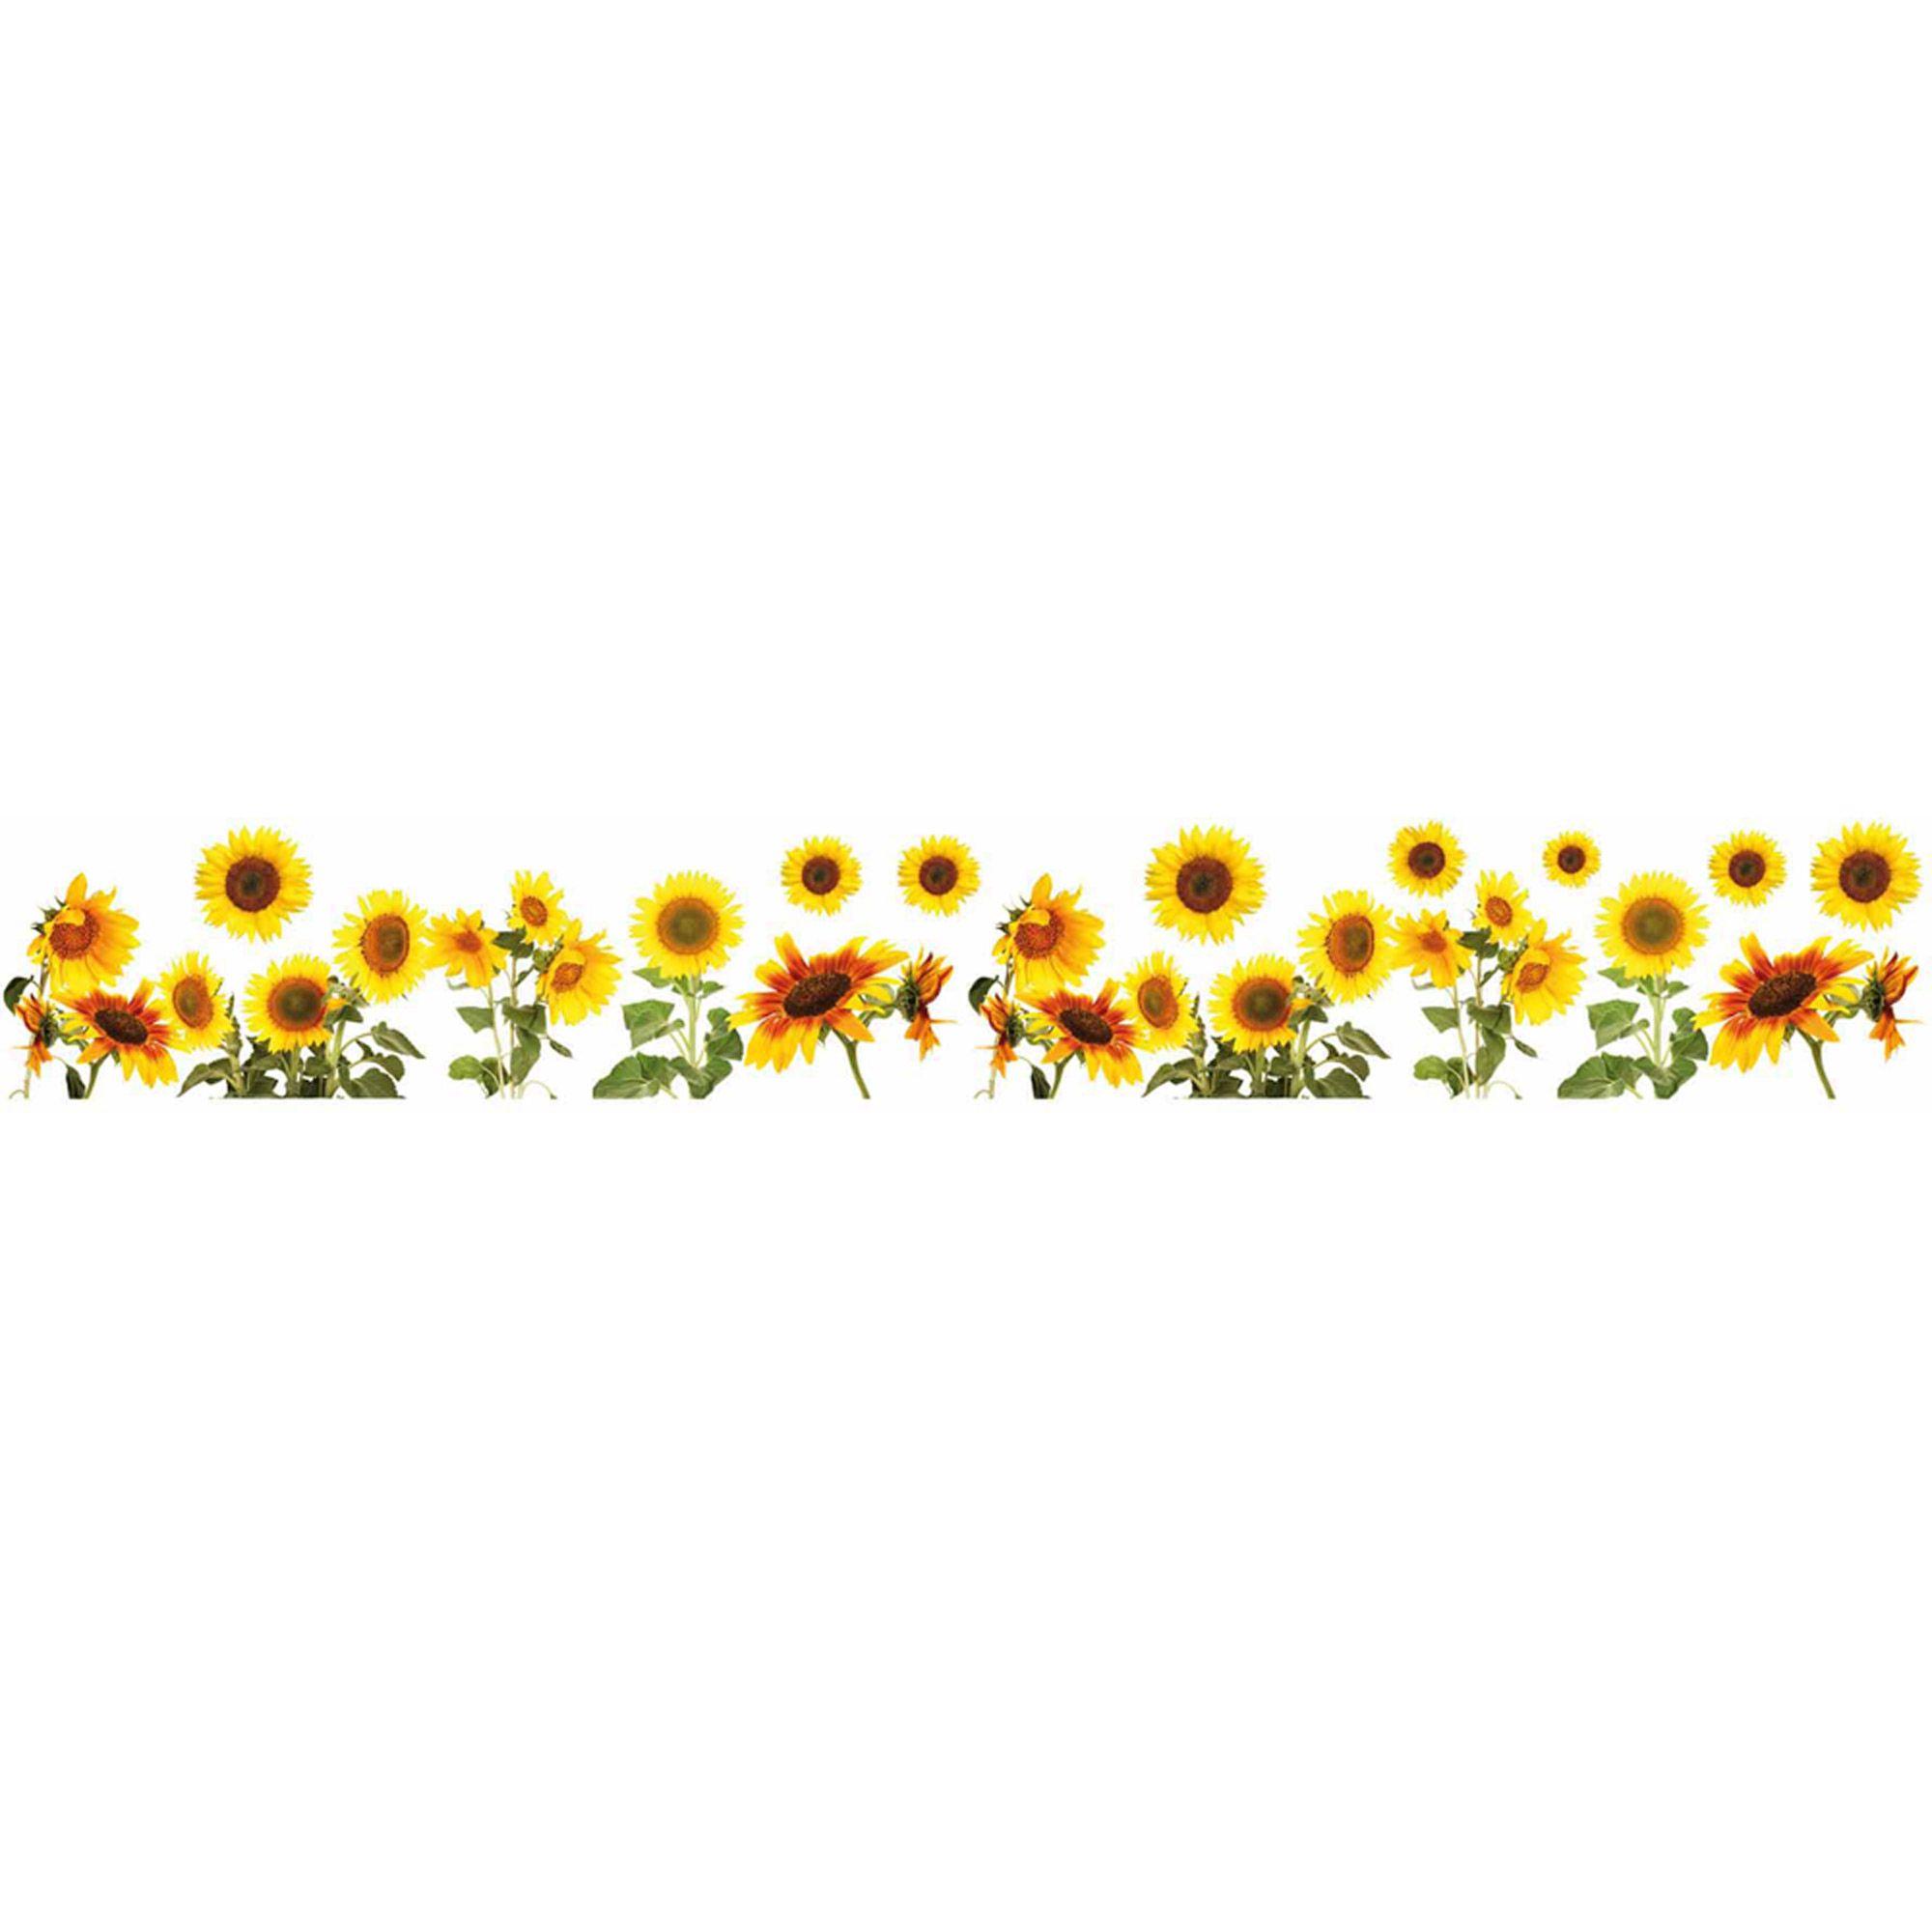 Home Improvement In 2020 Sunflower Canvas Sunflower Wallpaper